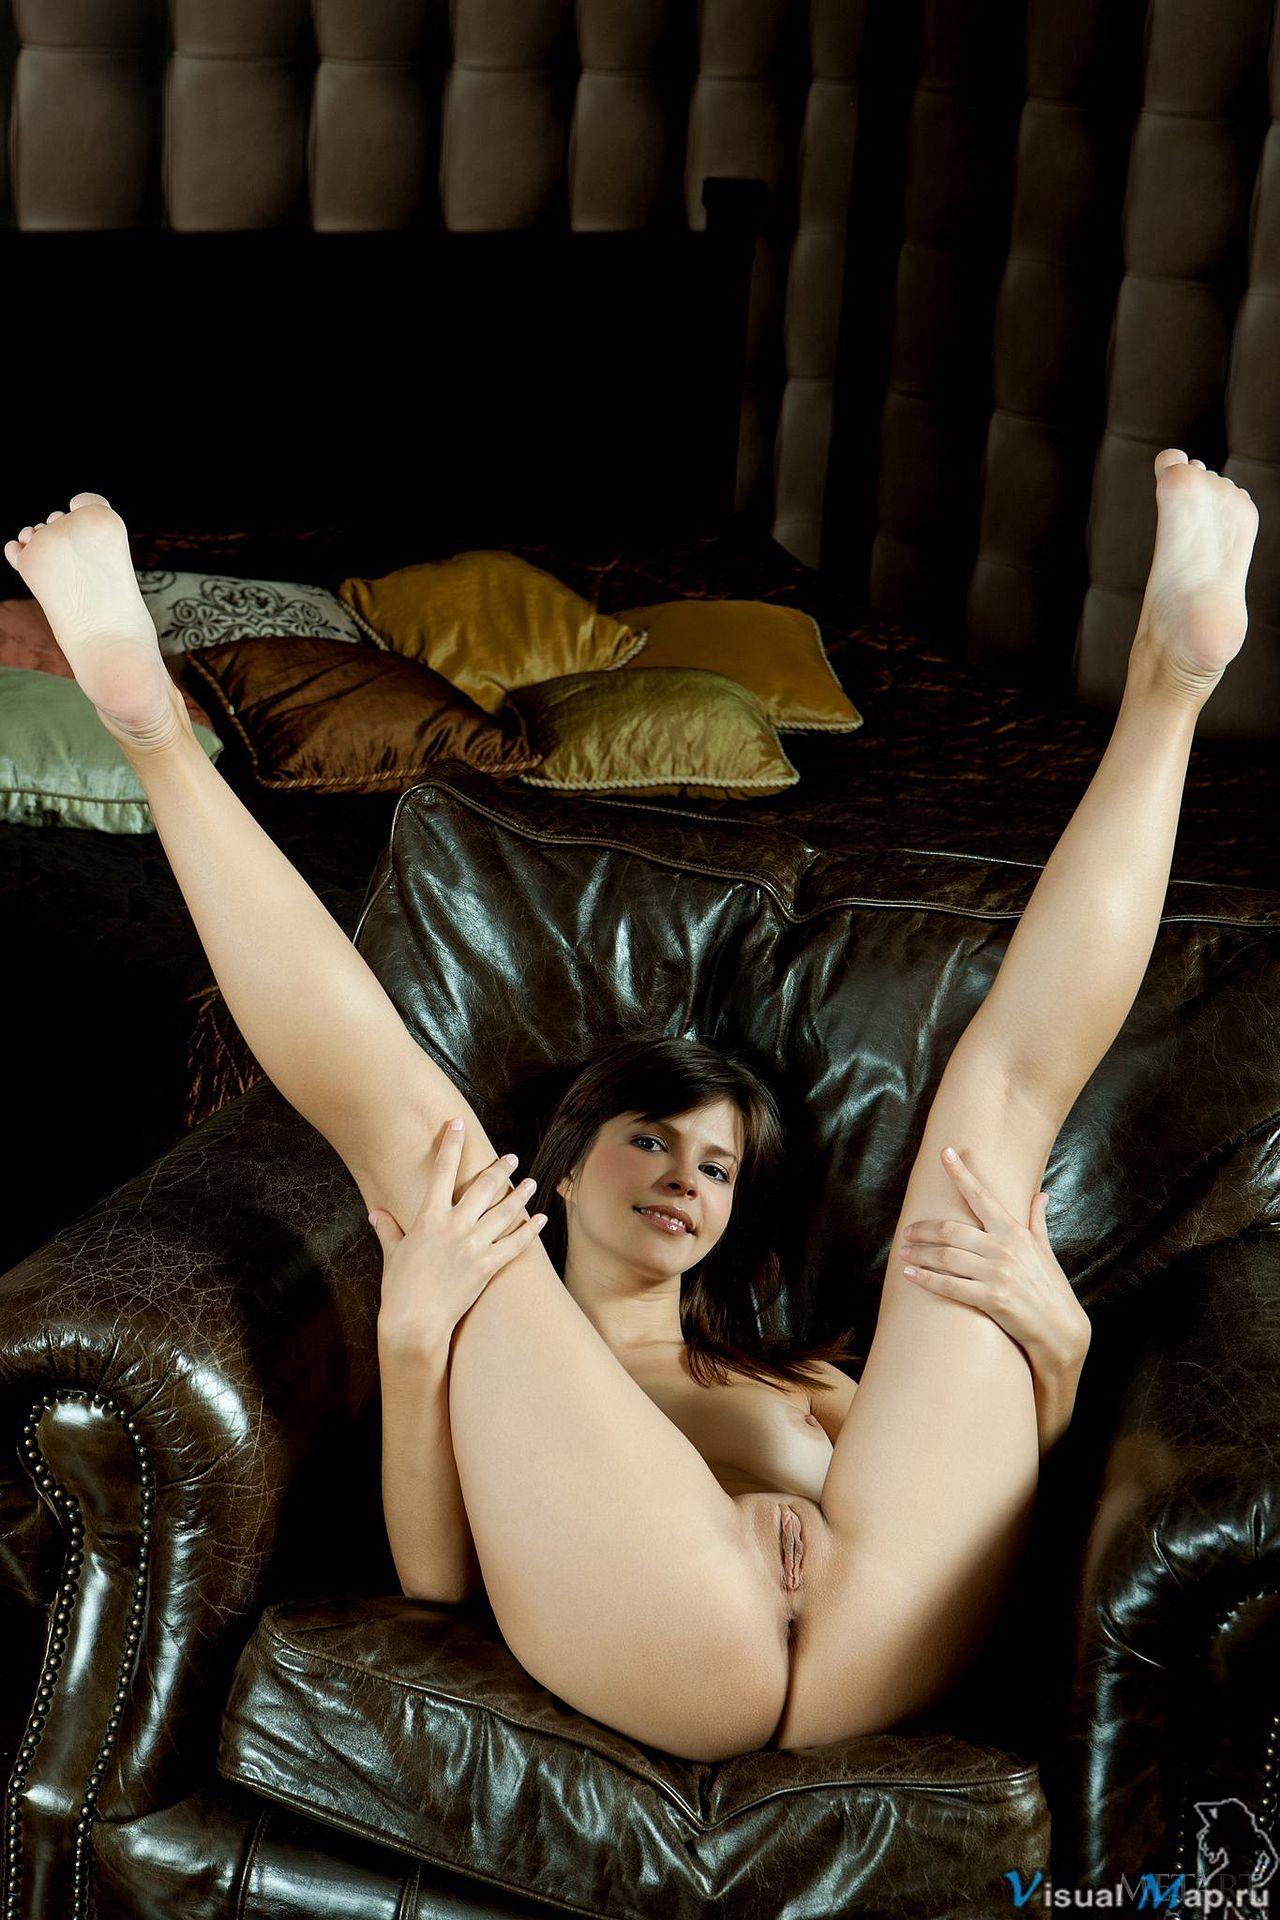 femme nue gratuit escort girl sens